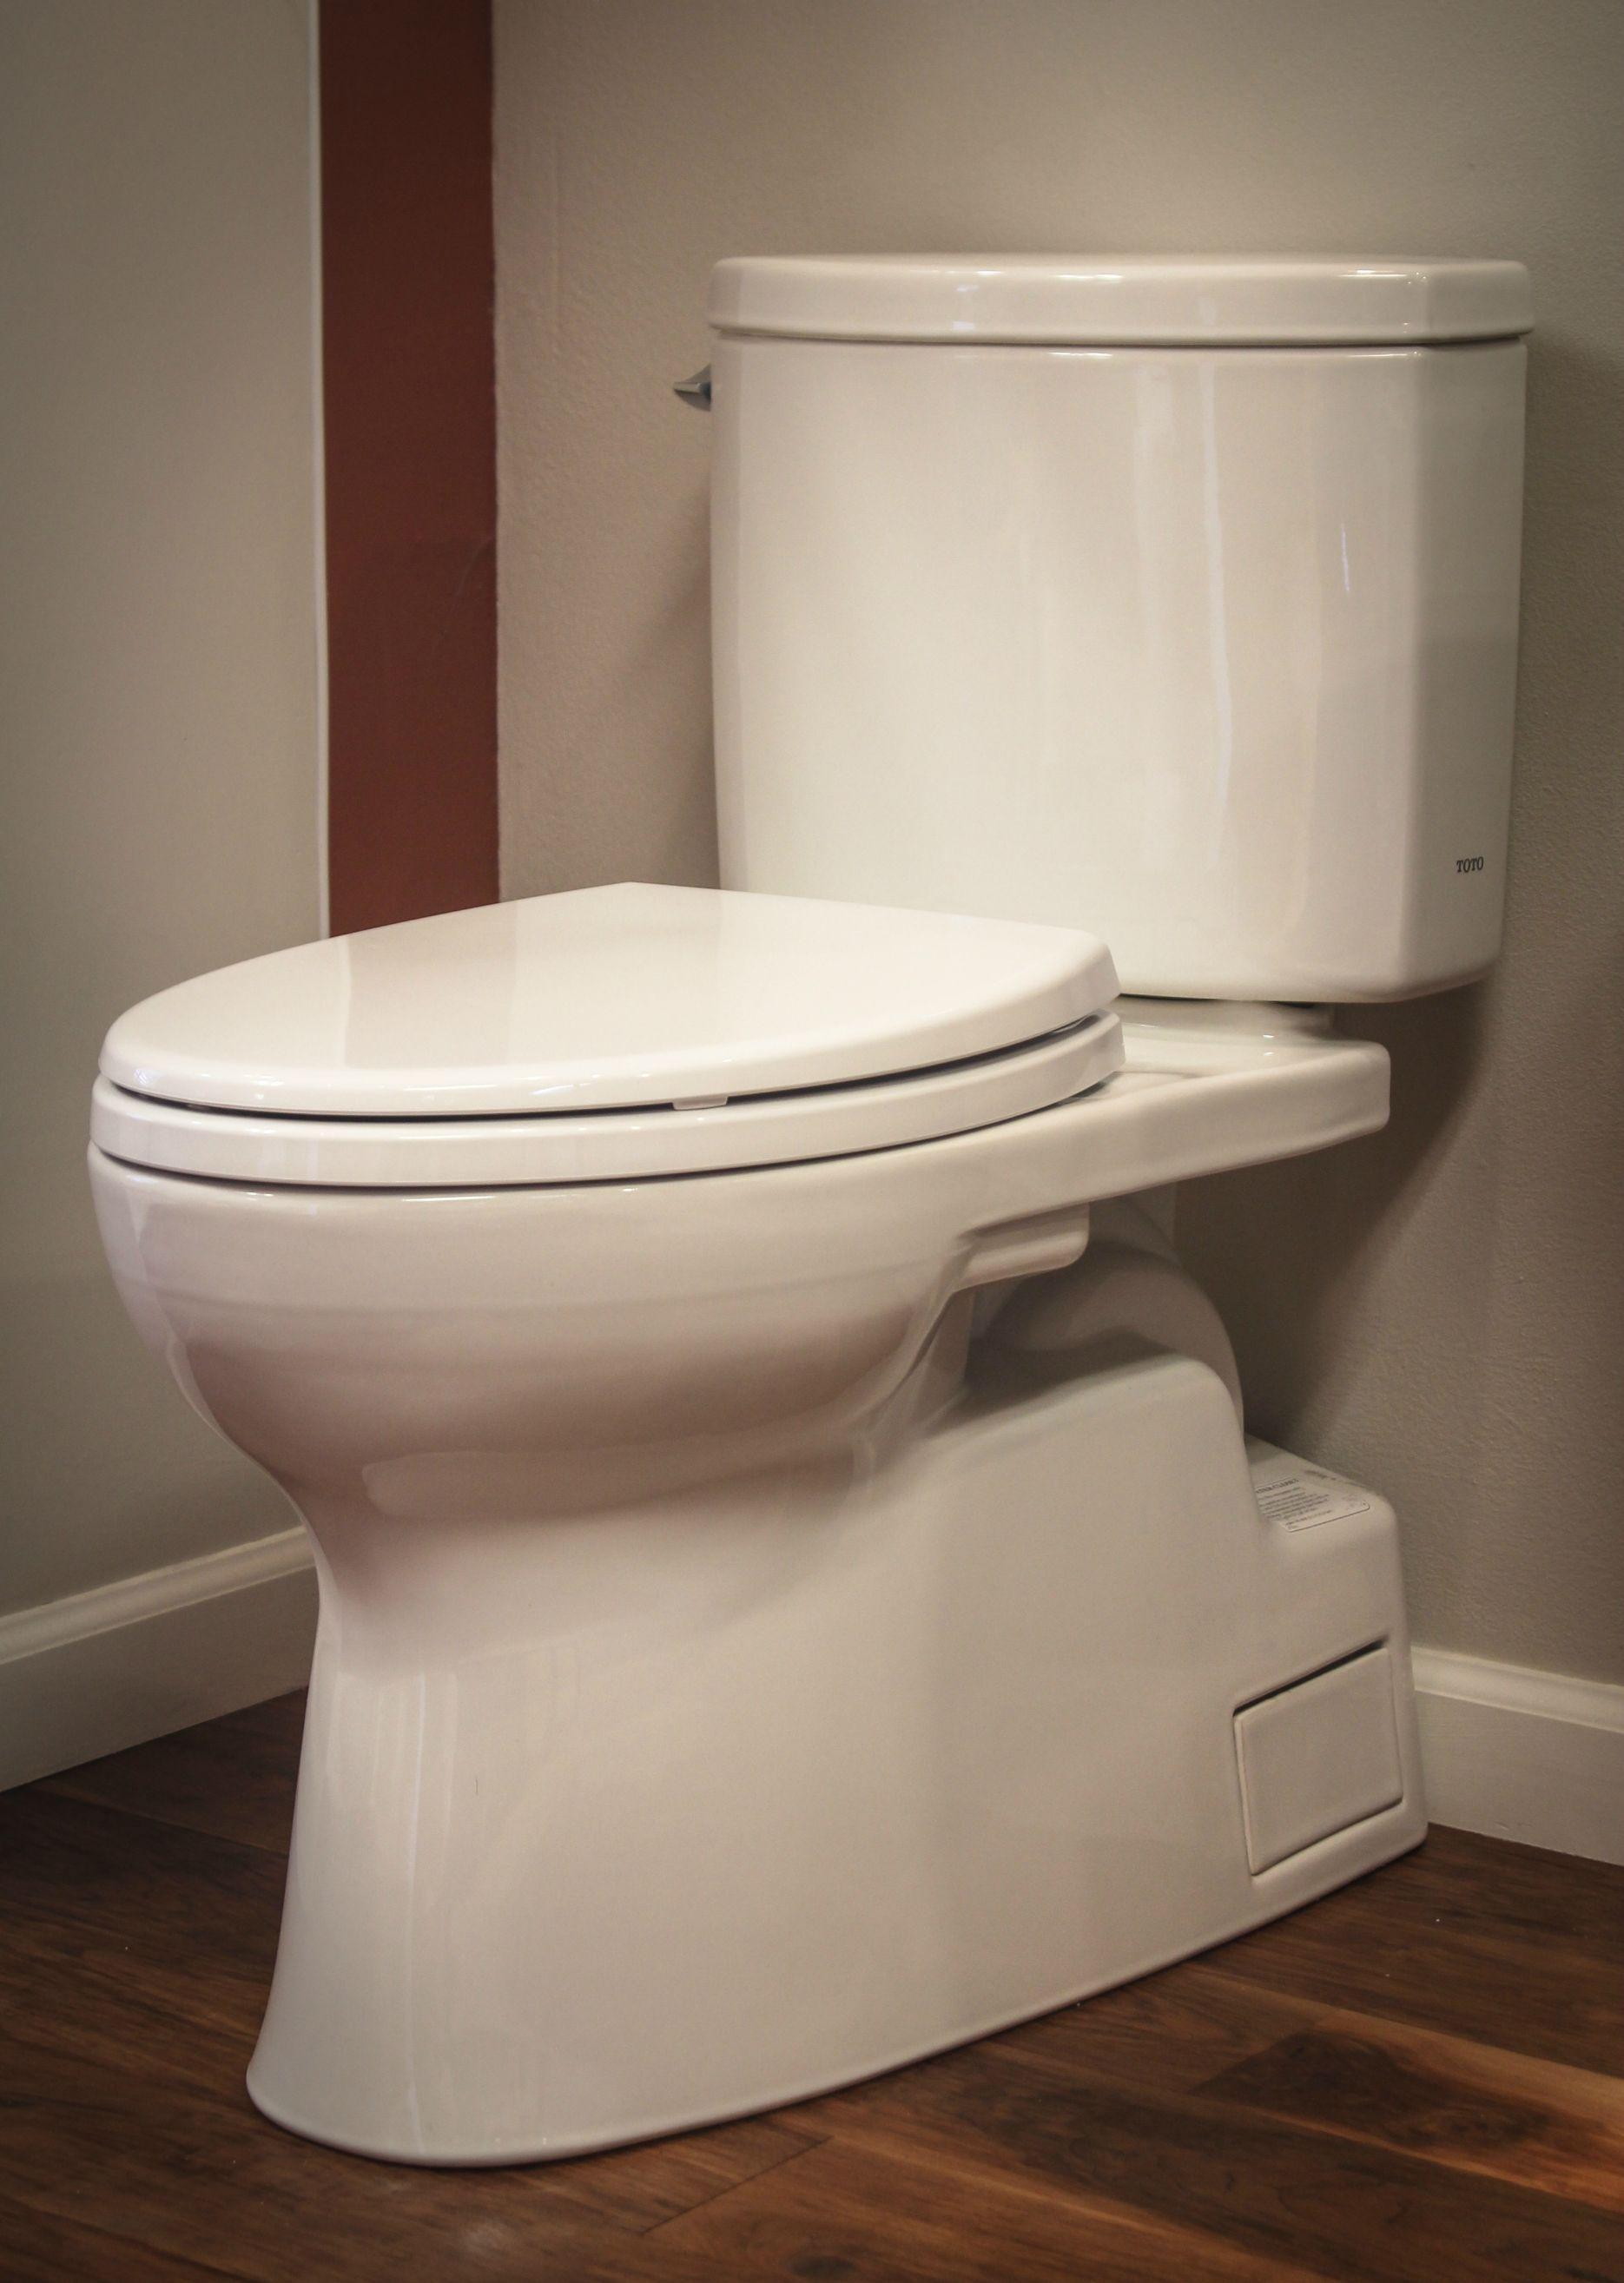 Toto Toilets Gallery – Josco Bath & Kitchen Showroom in Austin, Tx ...